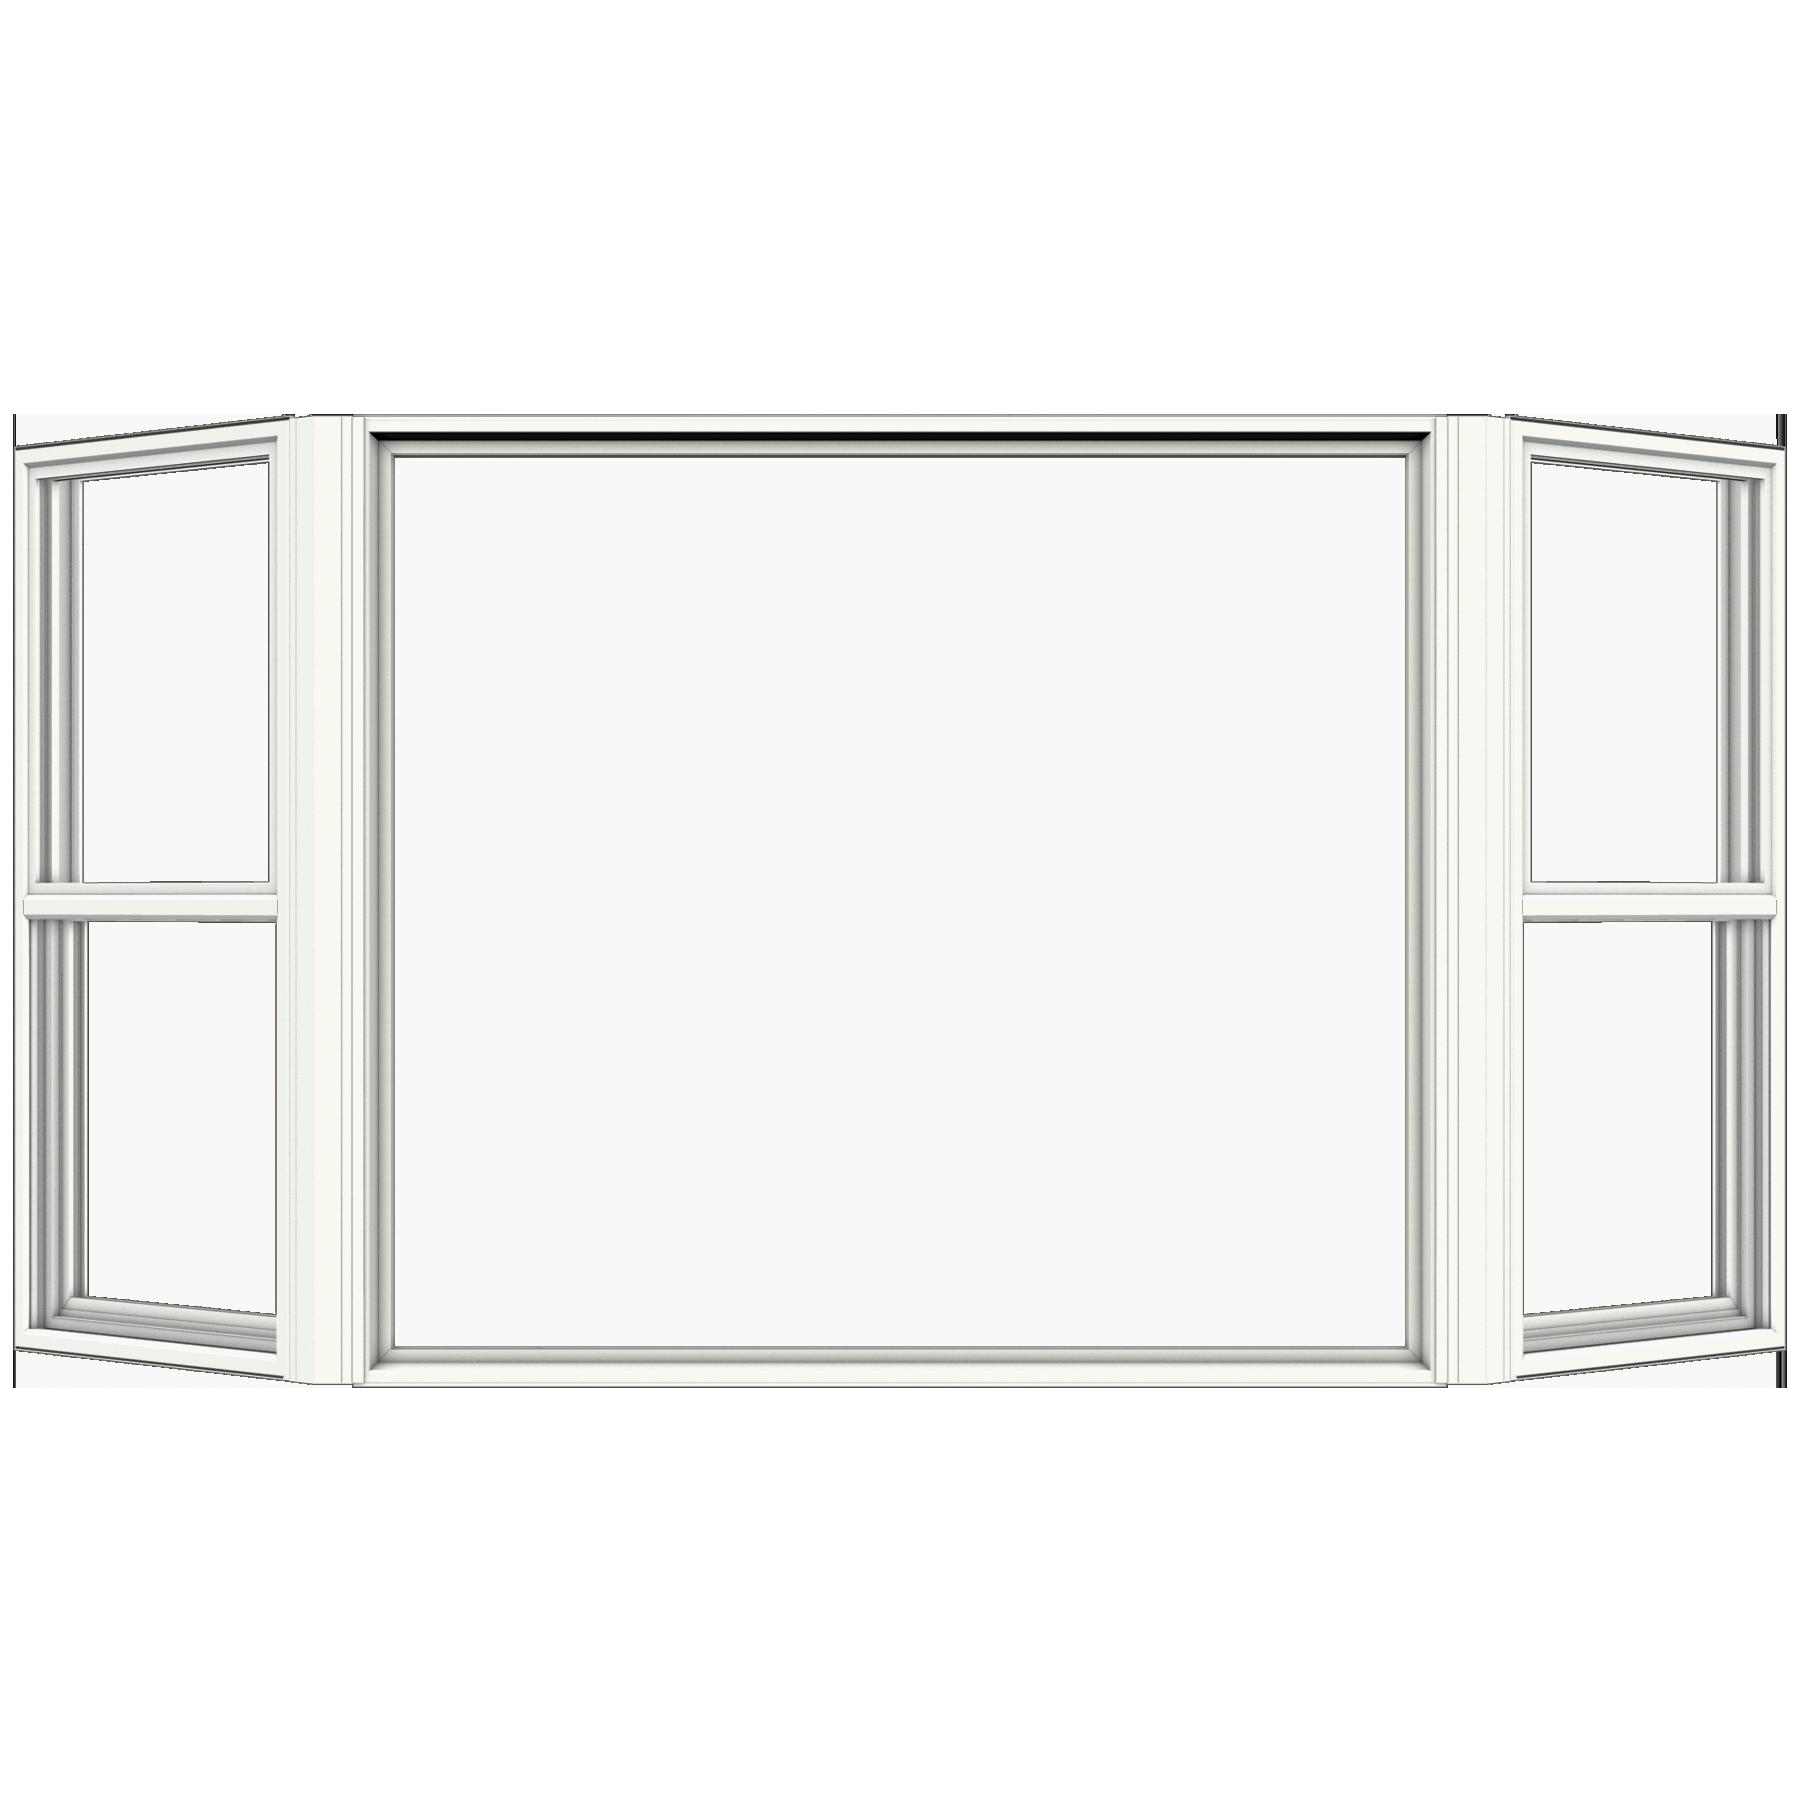 bpm select the premier building product search engine bay window http c2110432 cdn cloudfiles rackspacecloud com 190x190 fbcbf89a55c1bfd81ebd4e03bdc97fb6 png